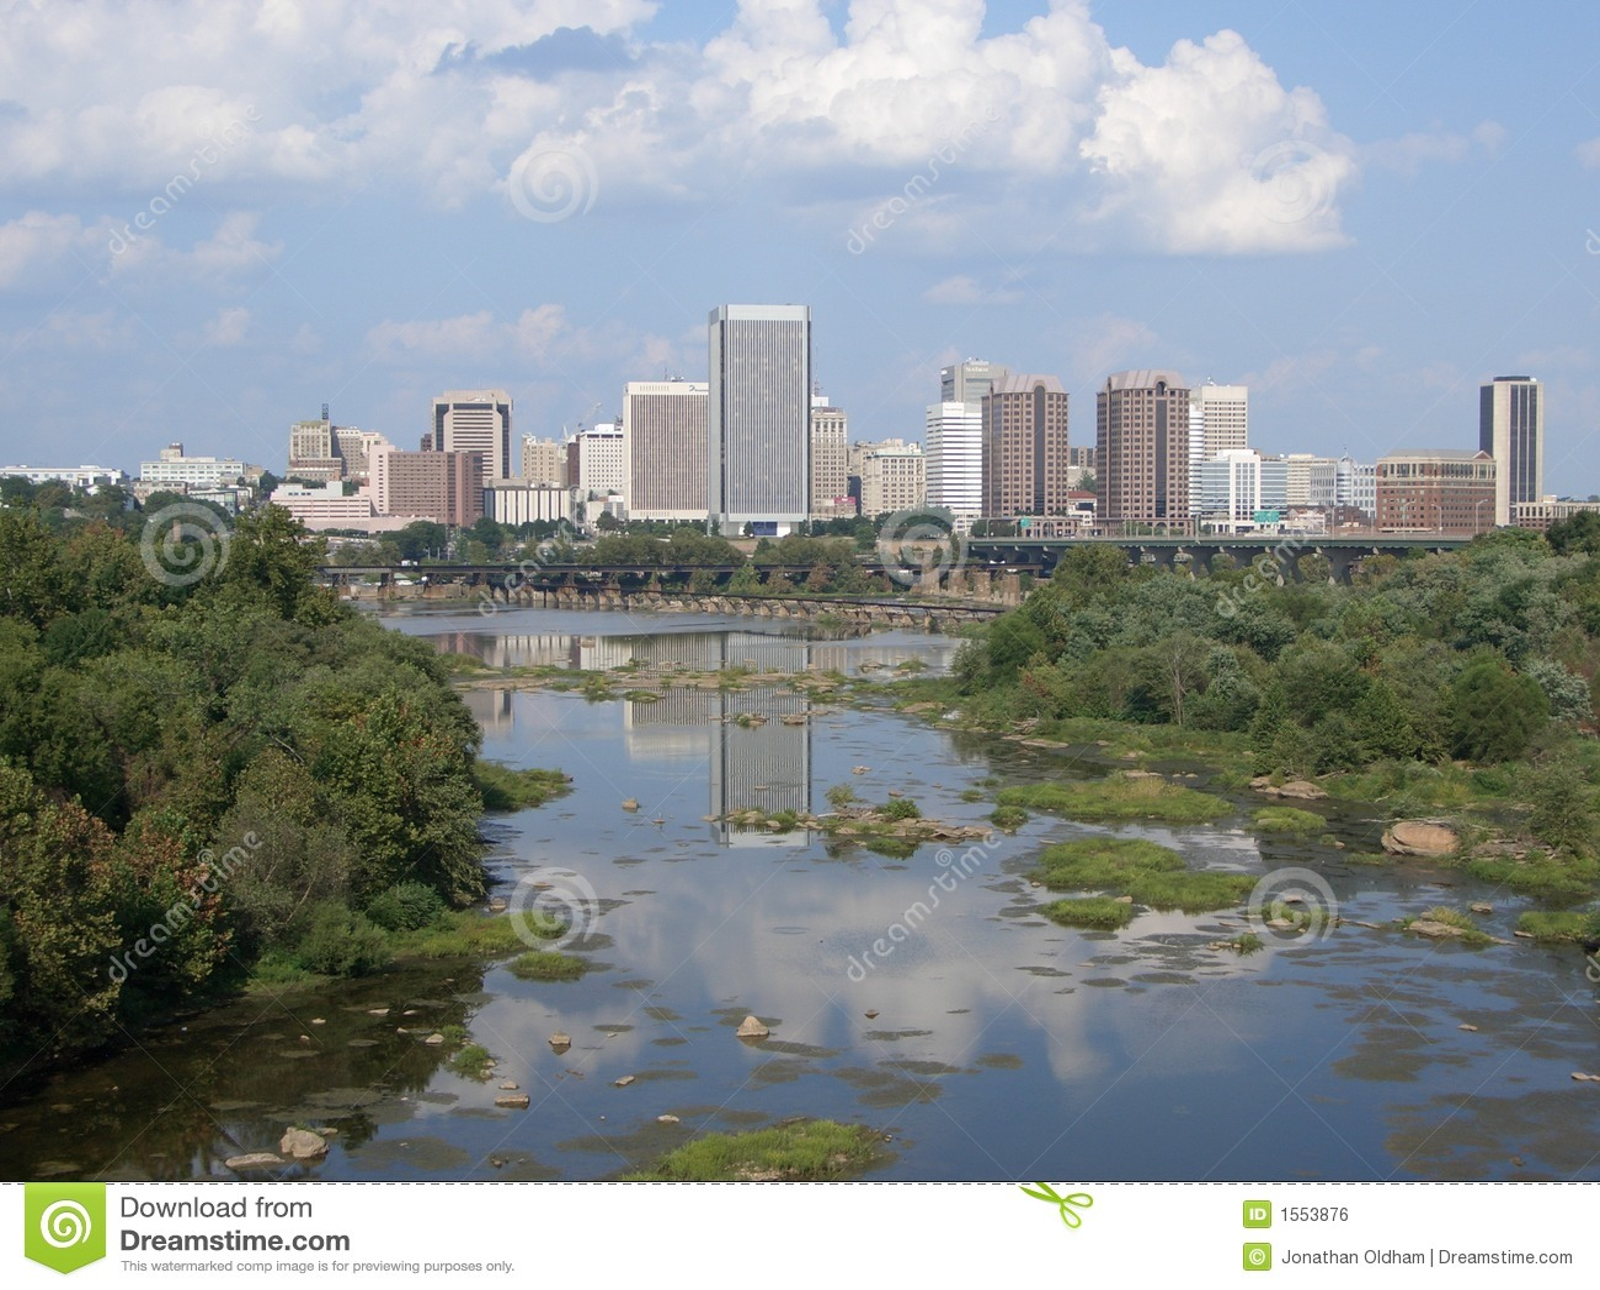 Downtown Richmond Virginia